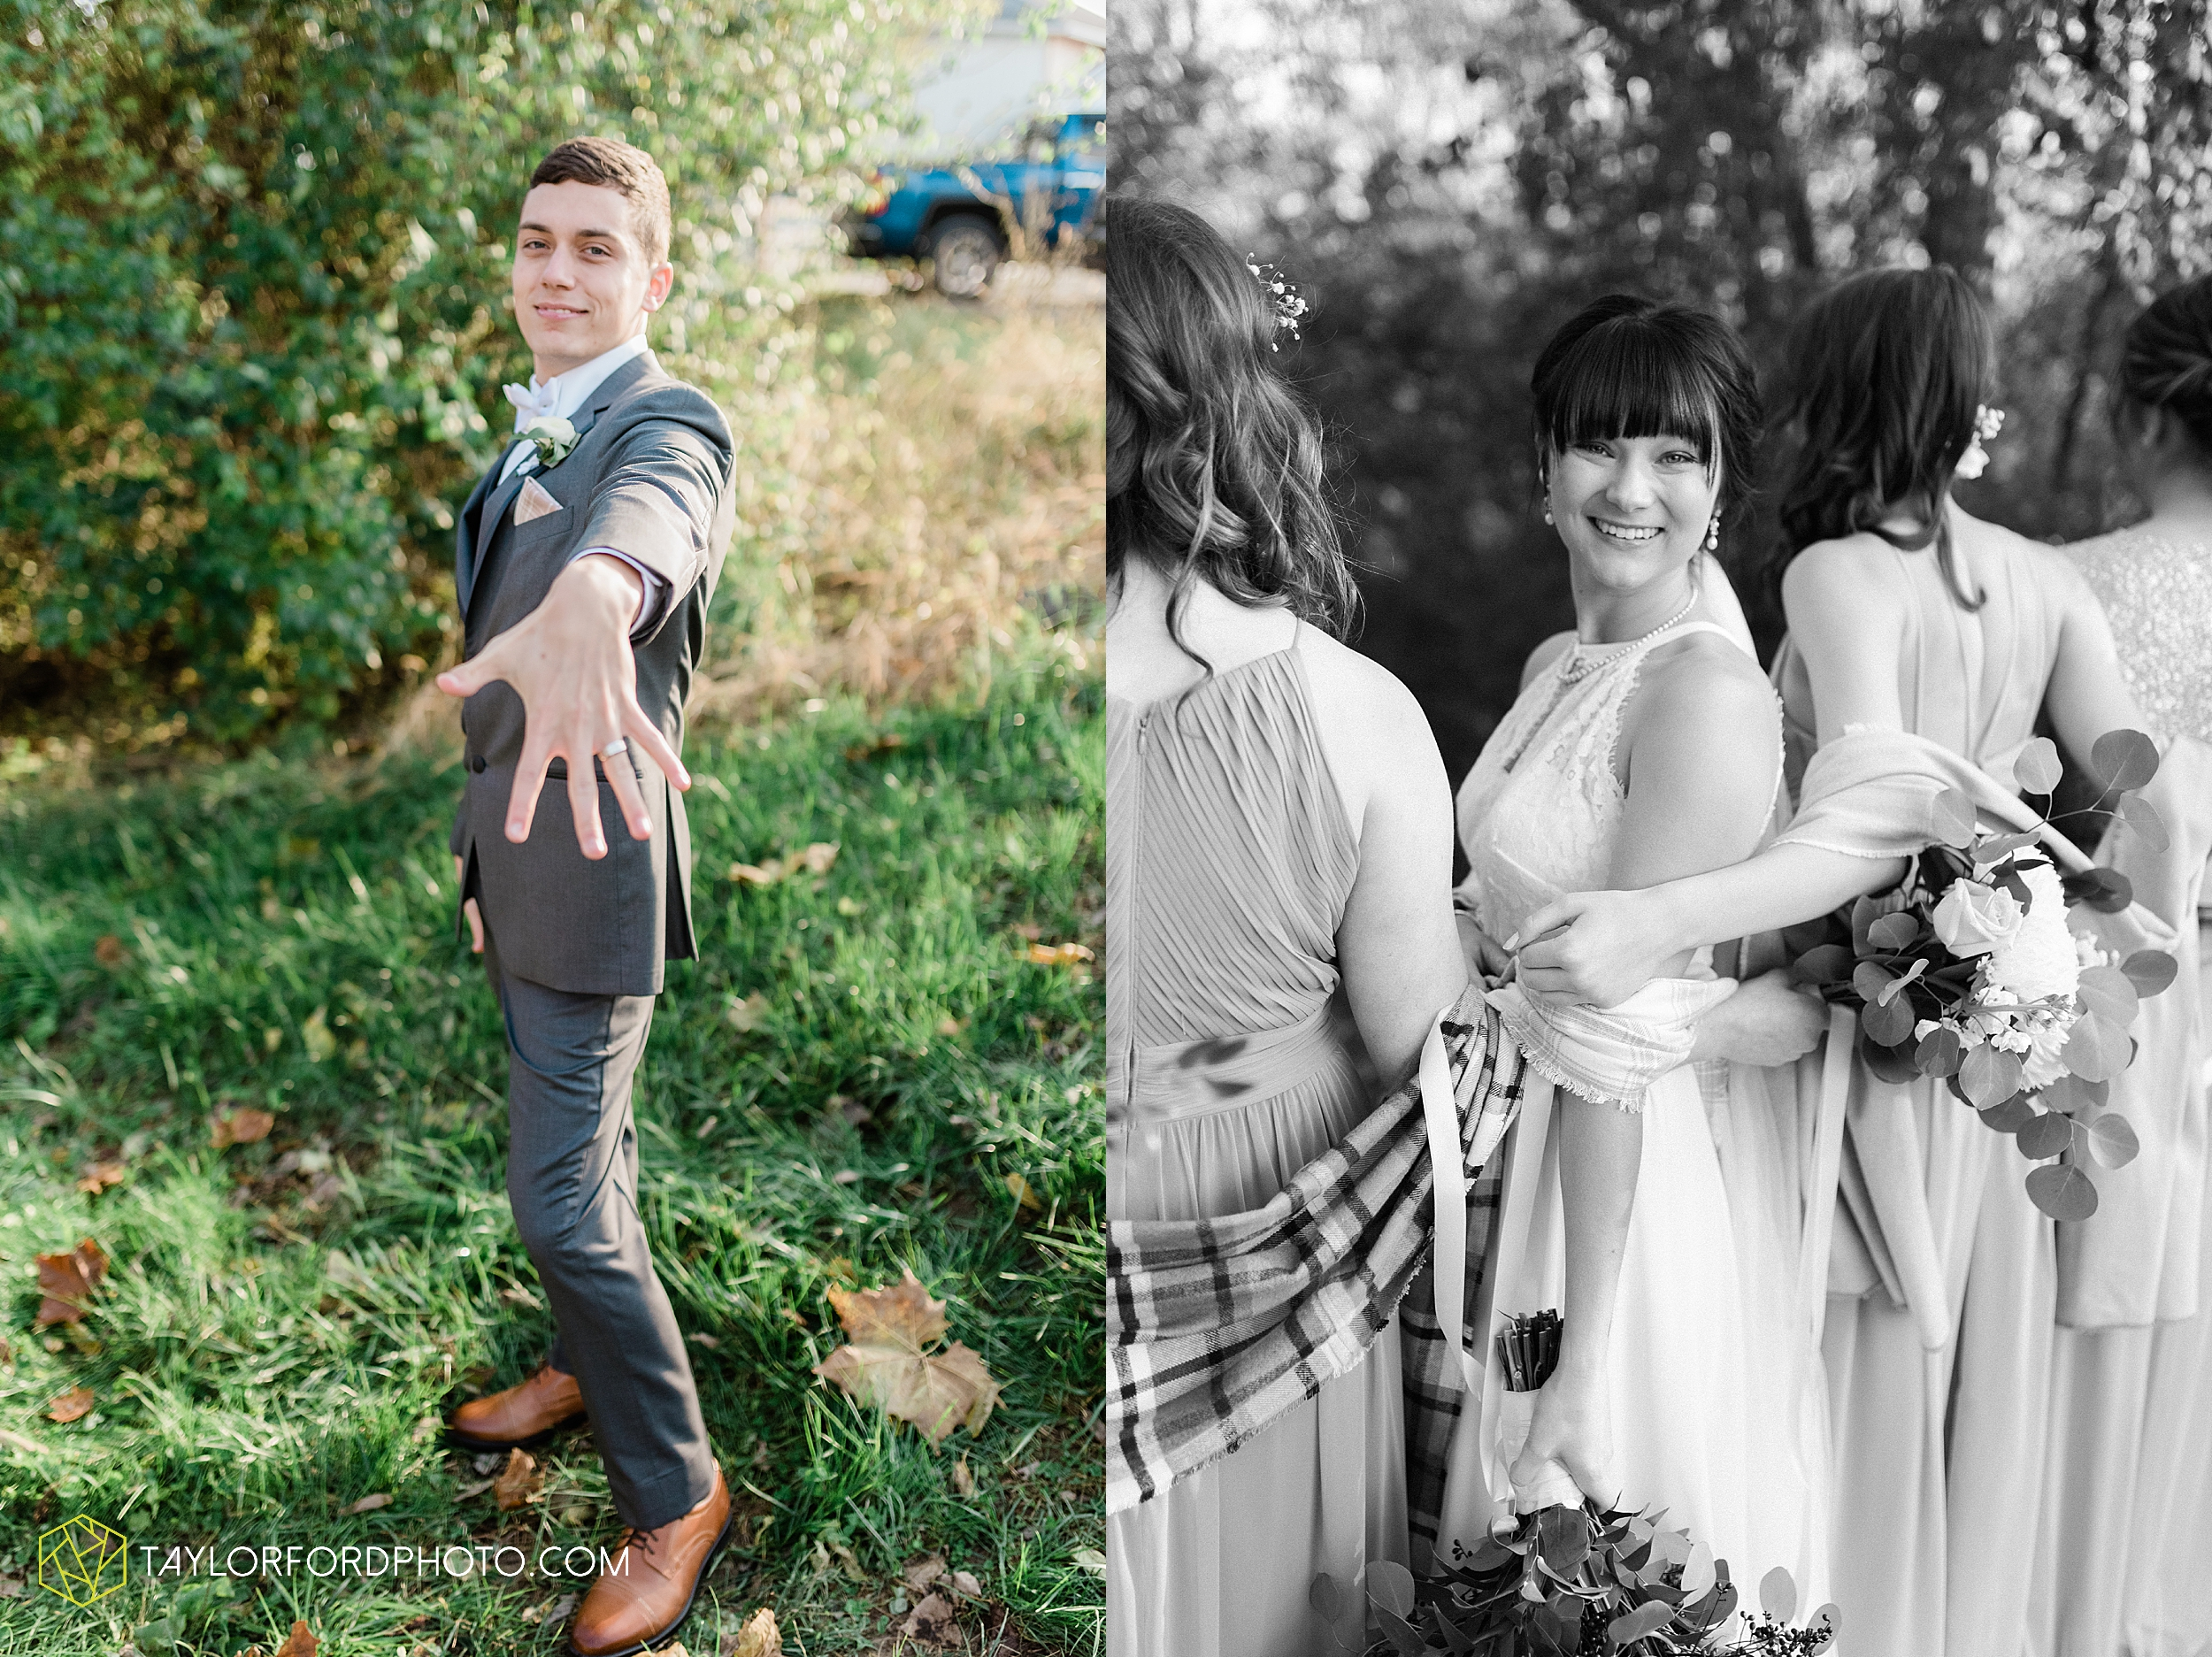 marissa-nicole-nick-daeger-orrmont-estate-farm-wedding-piqua-dayton-troy-ohio-fall-photographer-taylor-ford-photography_1542.jpg